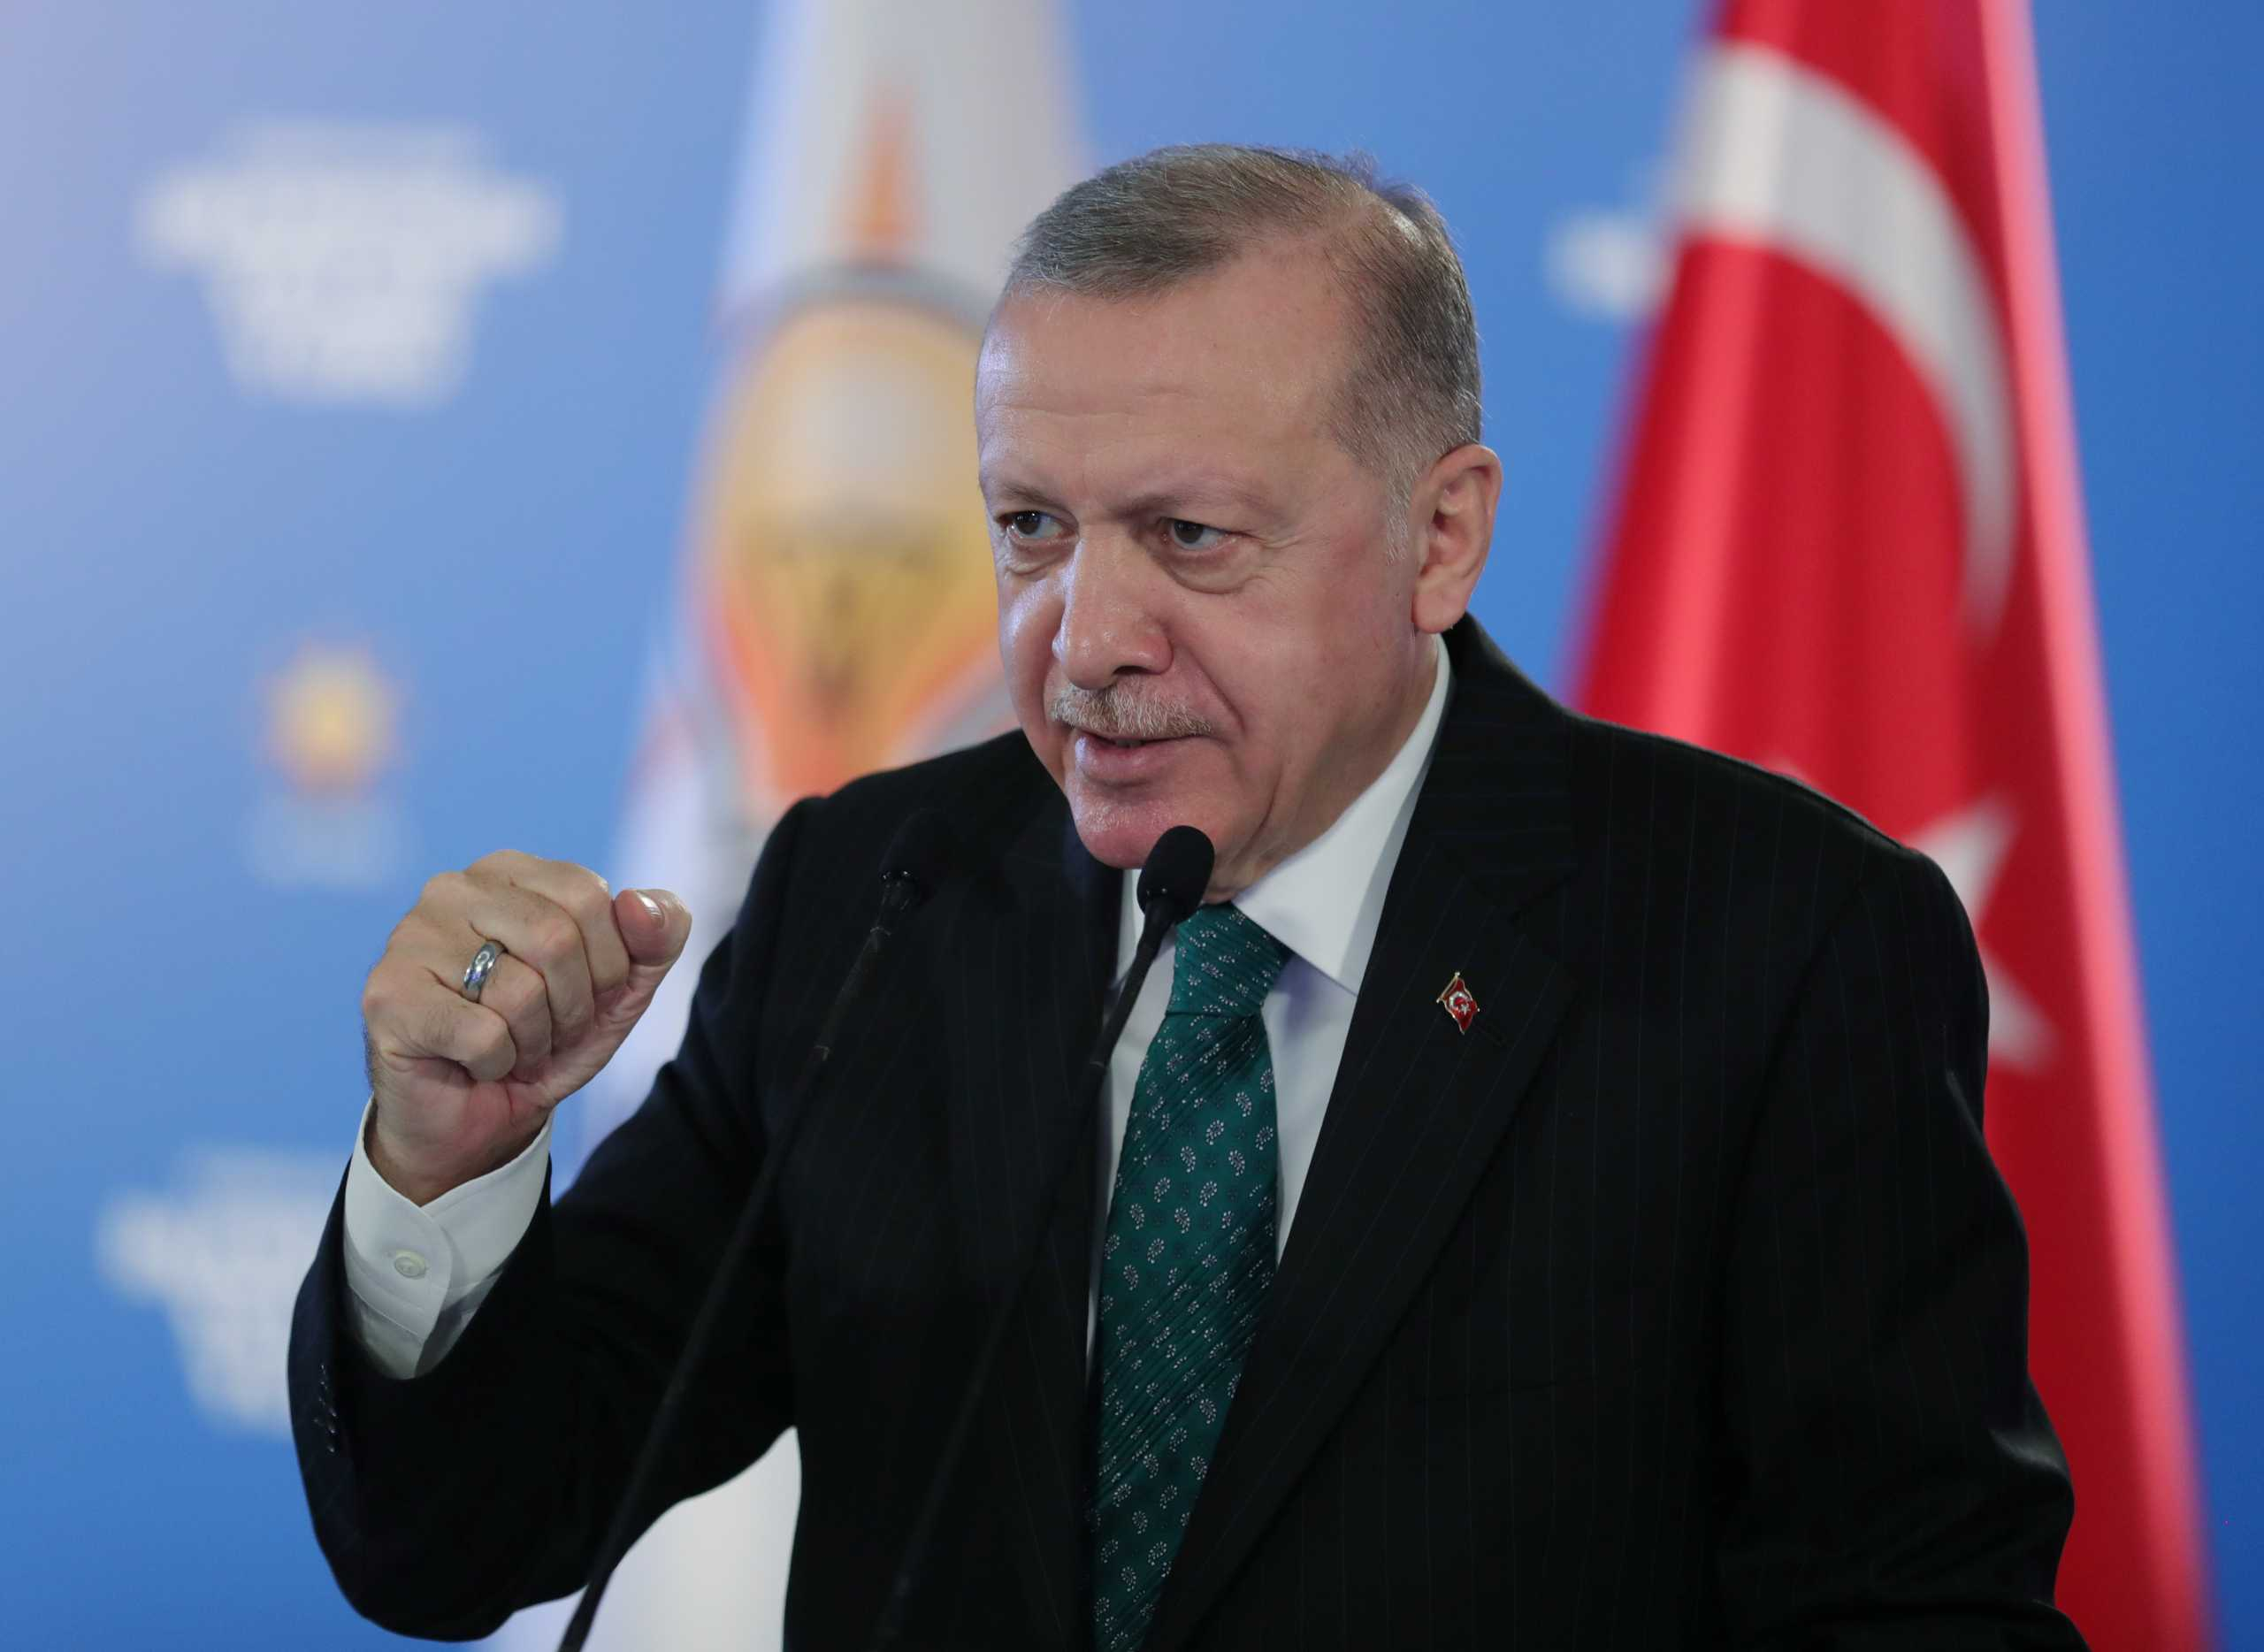 Pause στις αποκαλύψεις για την κυβέρνηση Ερντογάν – Ο Τούρκος αρχιμαφιόζος ετοιμάζει ταξίδι